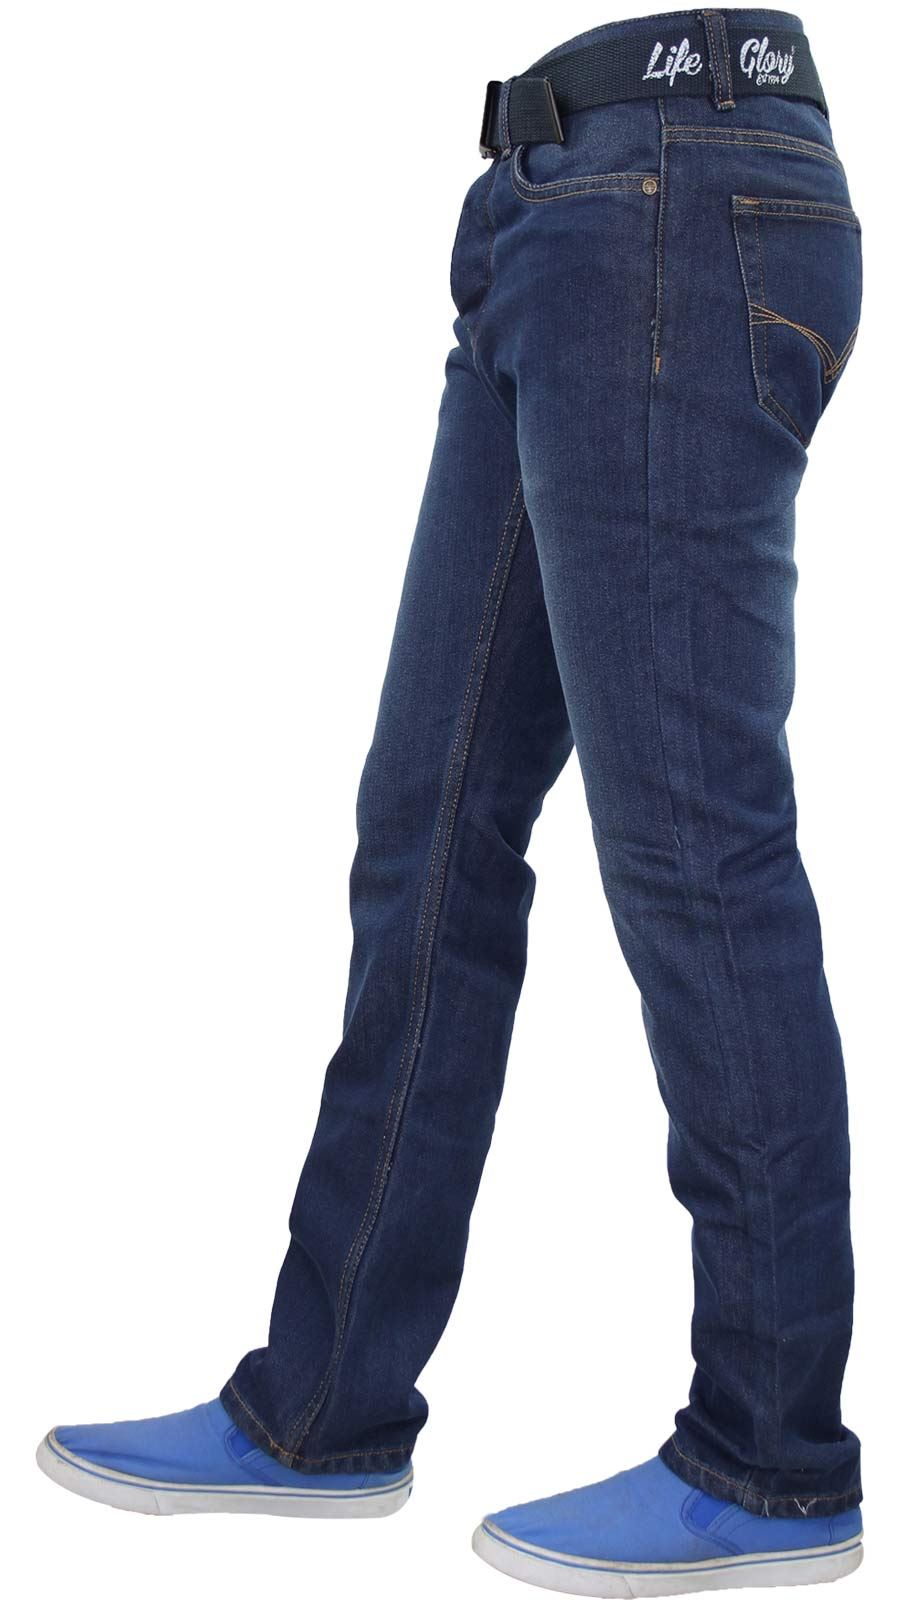 Men-Regular-Fit-Jeans-Denim-Button-Fly-Straight-Leg-Trouser-Pant-With-Free-Belt thumbnail 10